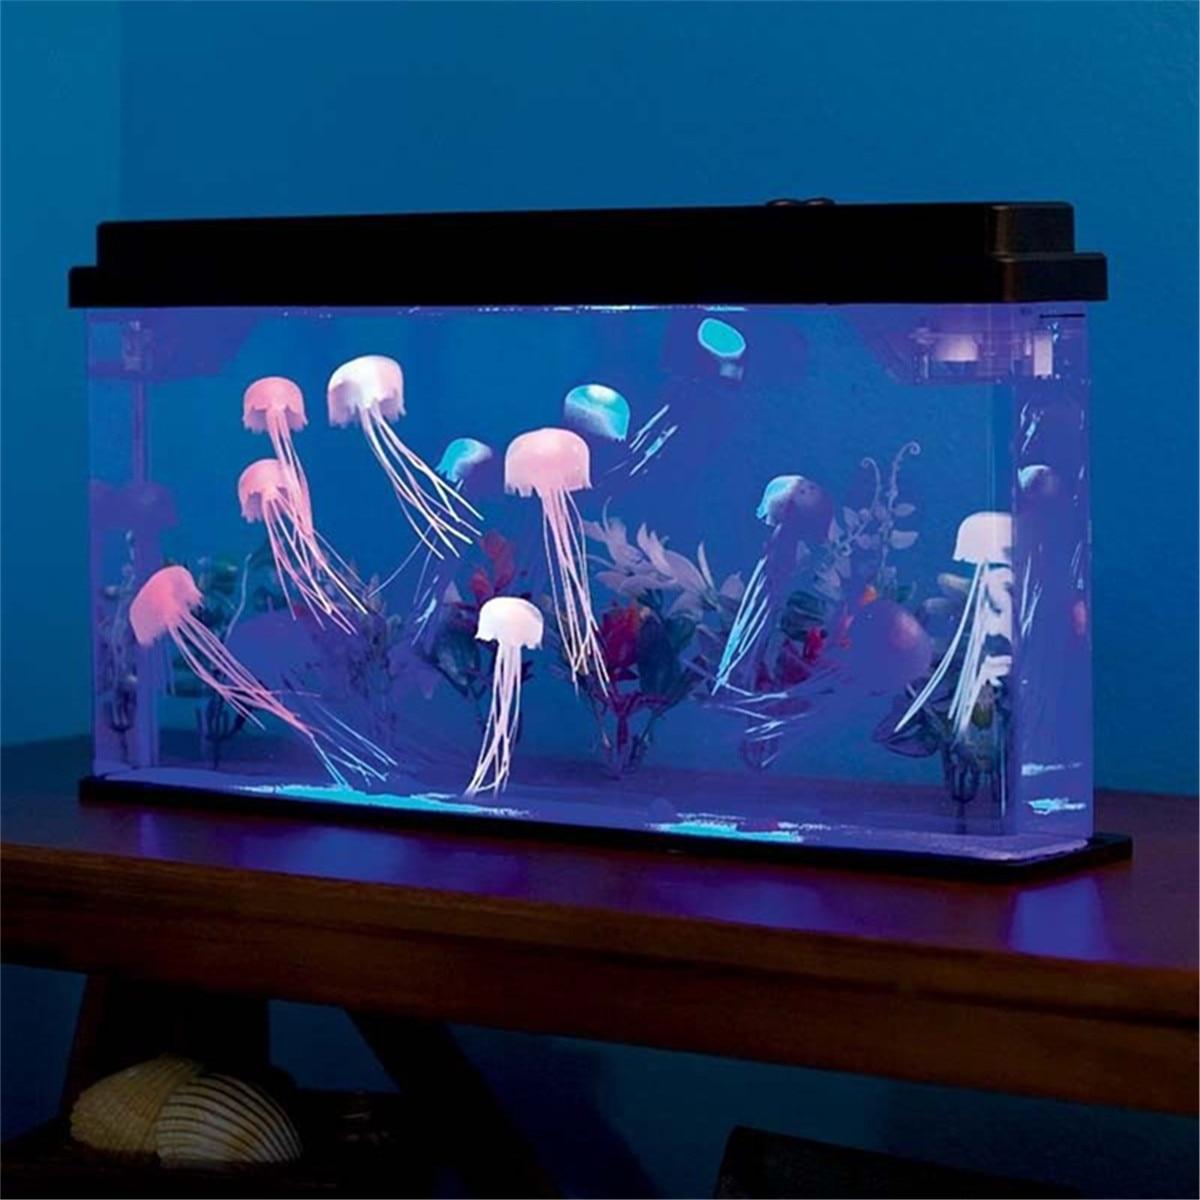 Jellyfish 45x8x24cm Deluxe LED Light Glowing Aquarium Fish PetsTank  Household Home Decor Underwater World BackgroundJellyfish 45x8x24cm Deluxe LED Light Glowing Aquarium Fish PetsTank  Household Home Decor Underwater World Background